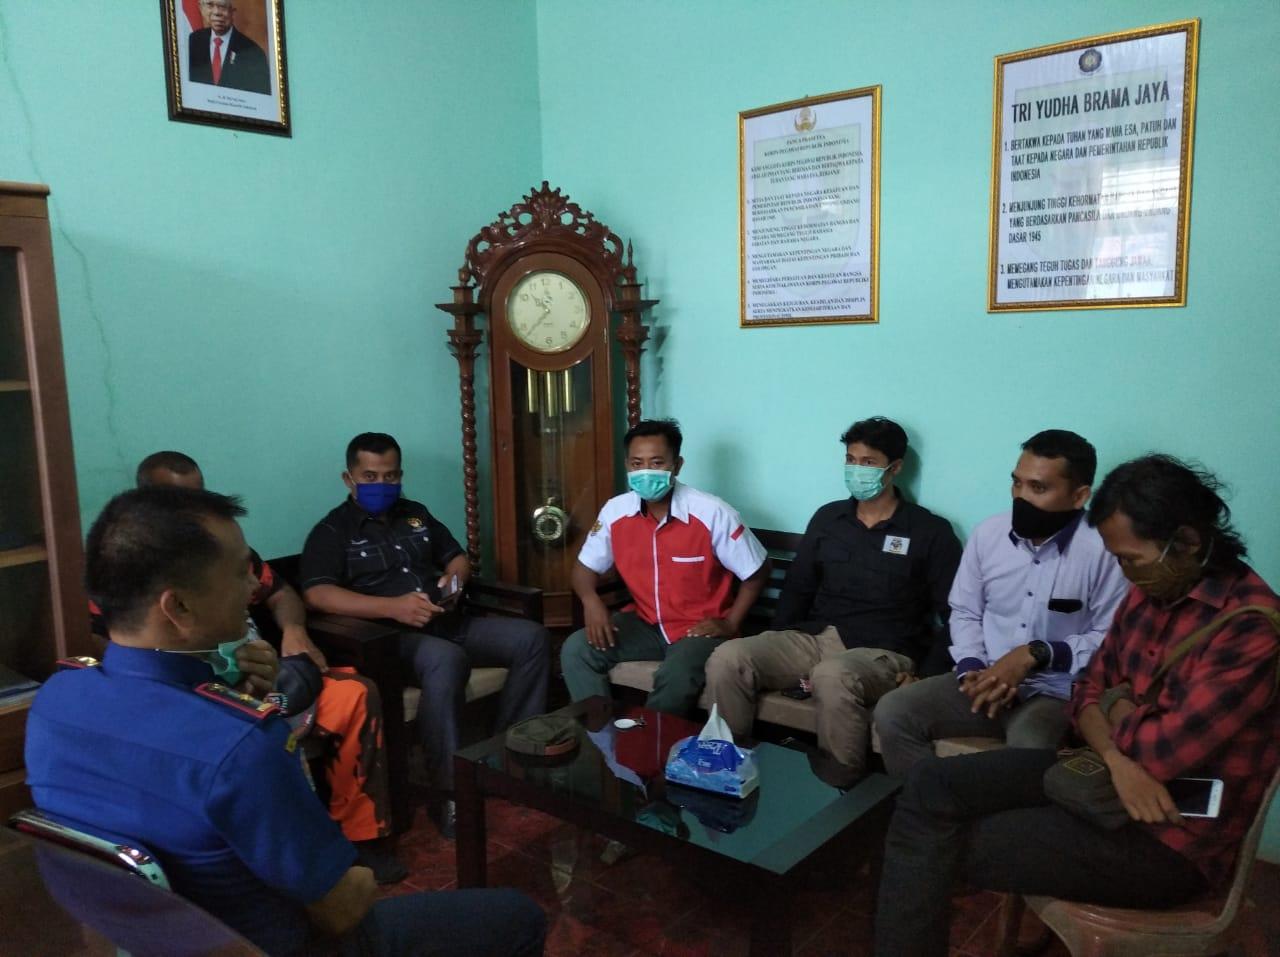 You are currently viewing Ormas OKP Temui Satgas Covid-19 Natuna, Minta Siapkan Lokasi Karantina Massal di Kecamatan